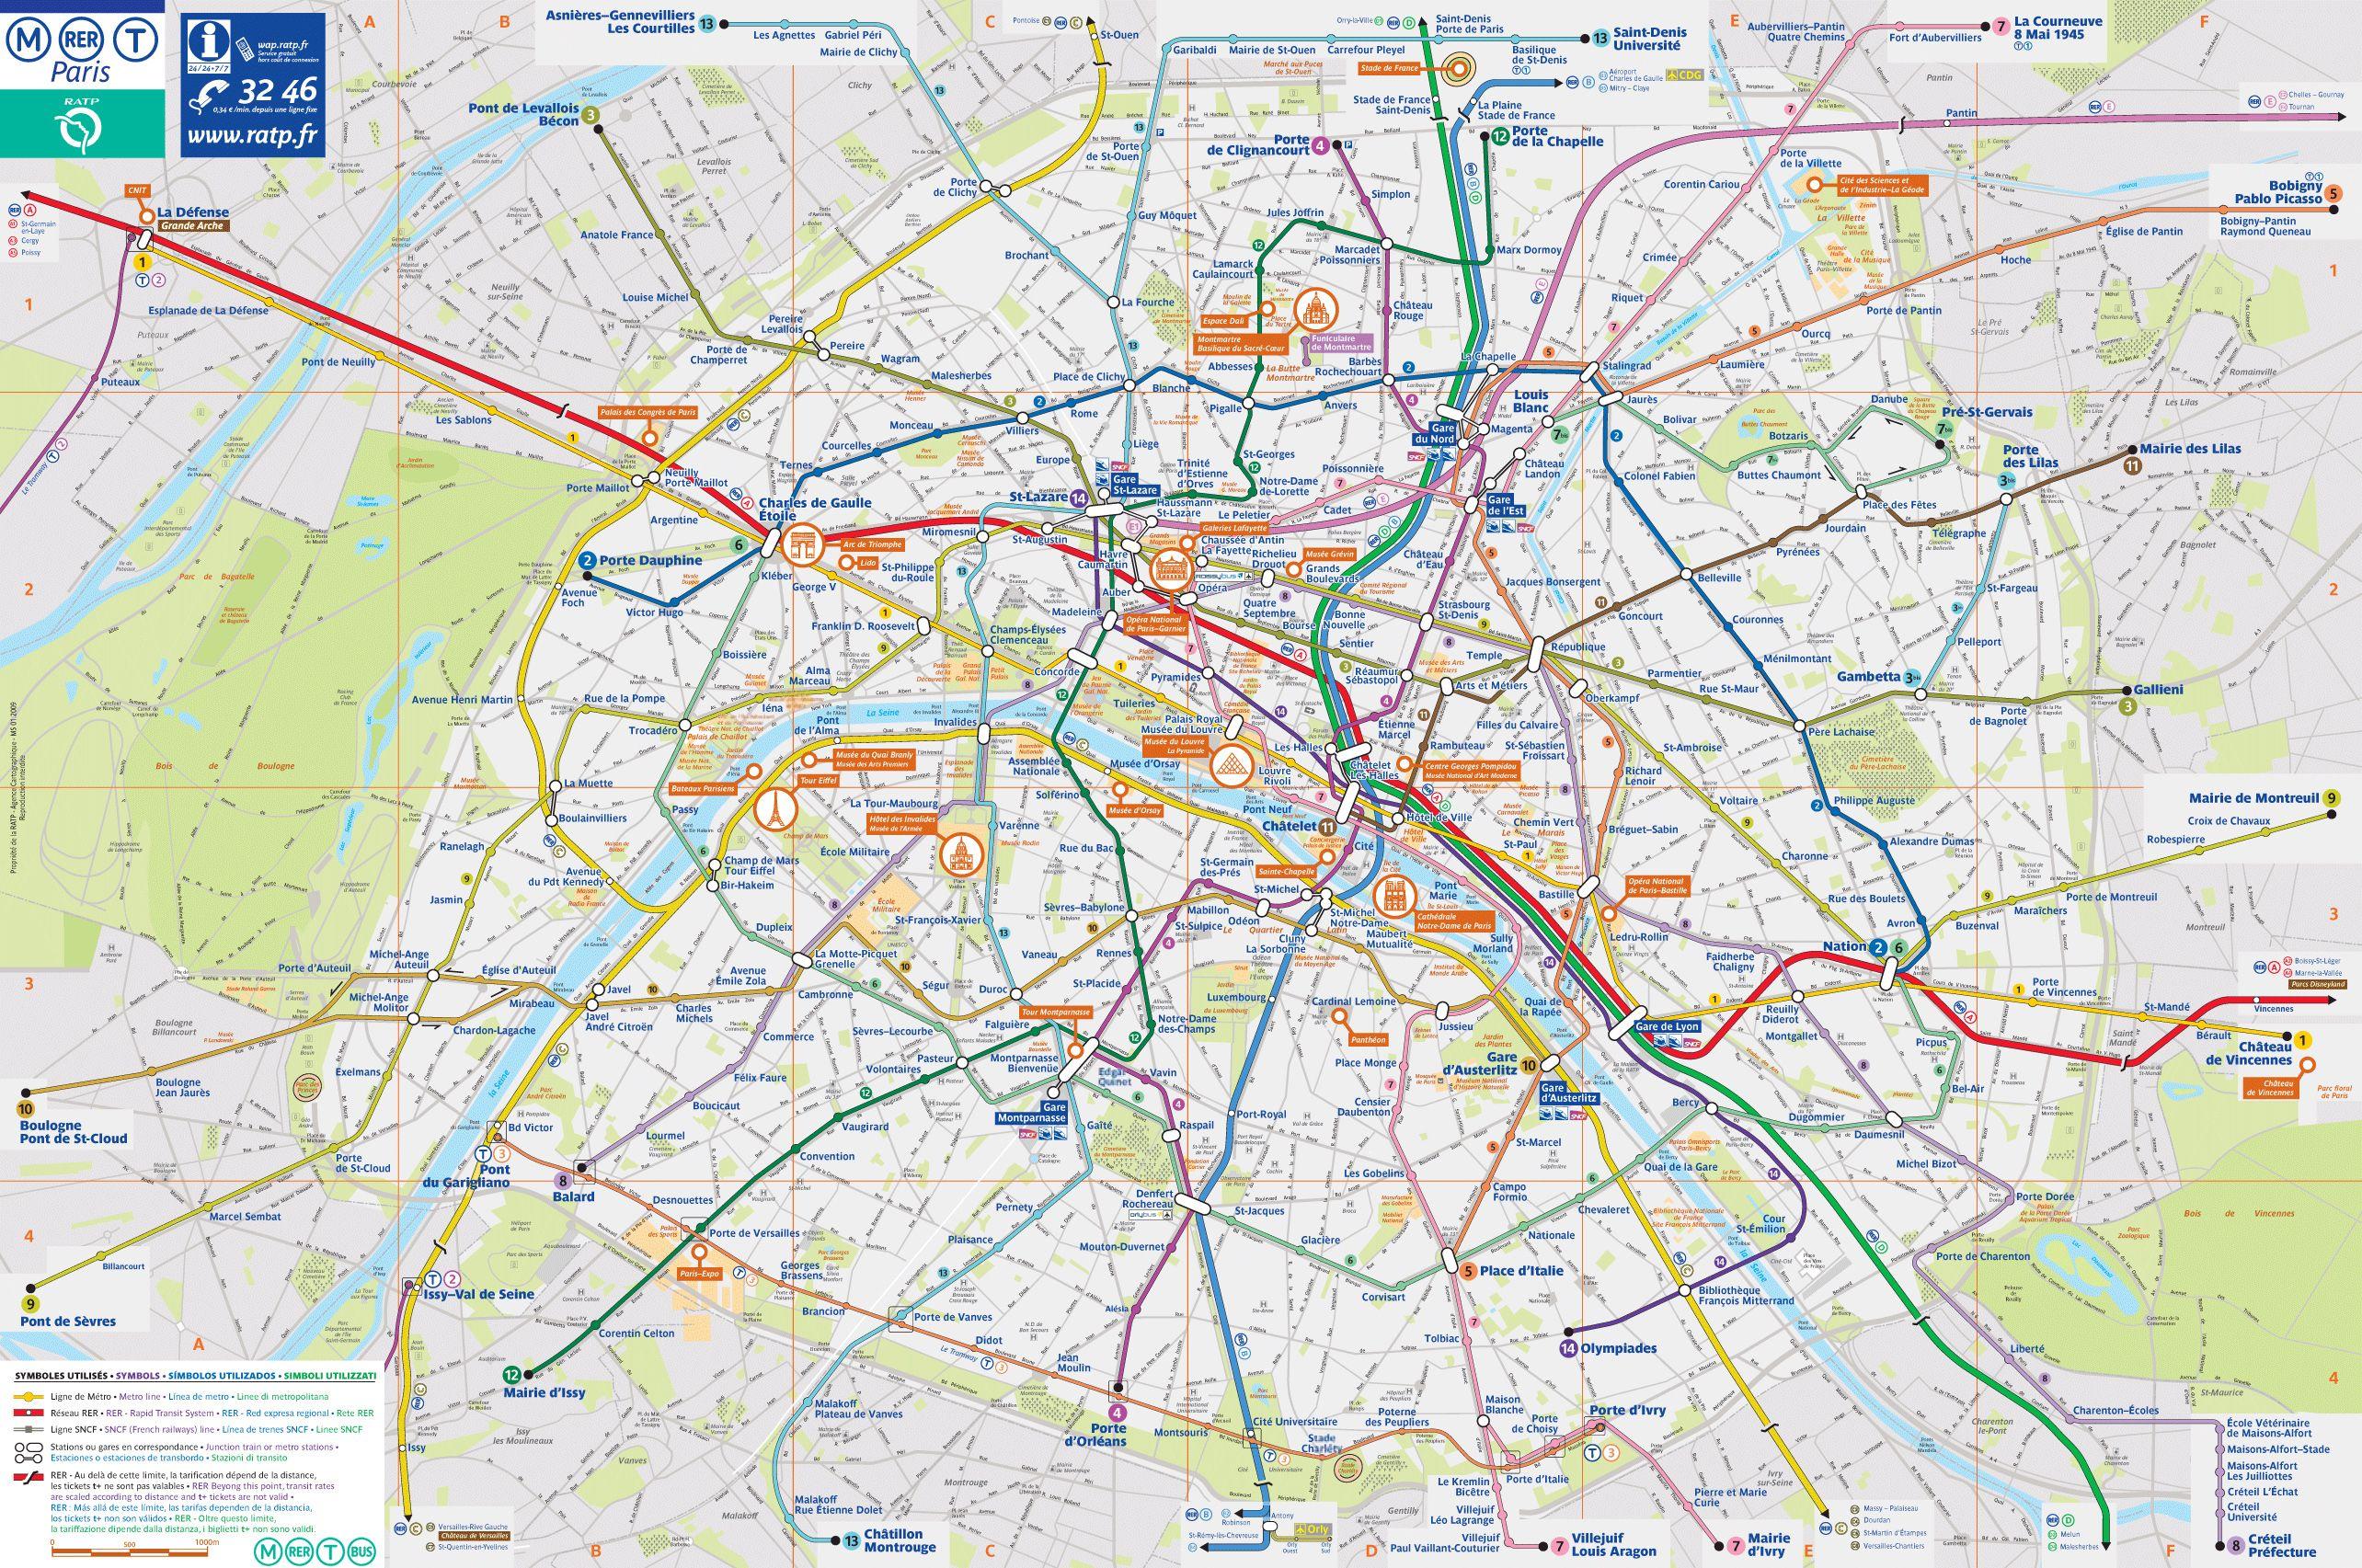 Paris Metro Maps For Tourists Map Of Paris City Paris City - Large map of paris france